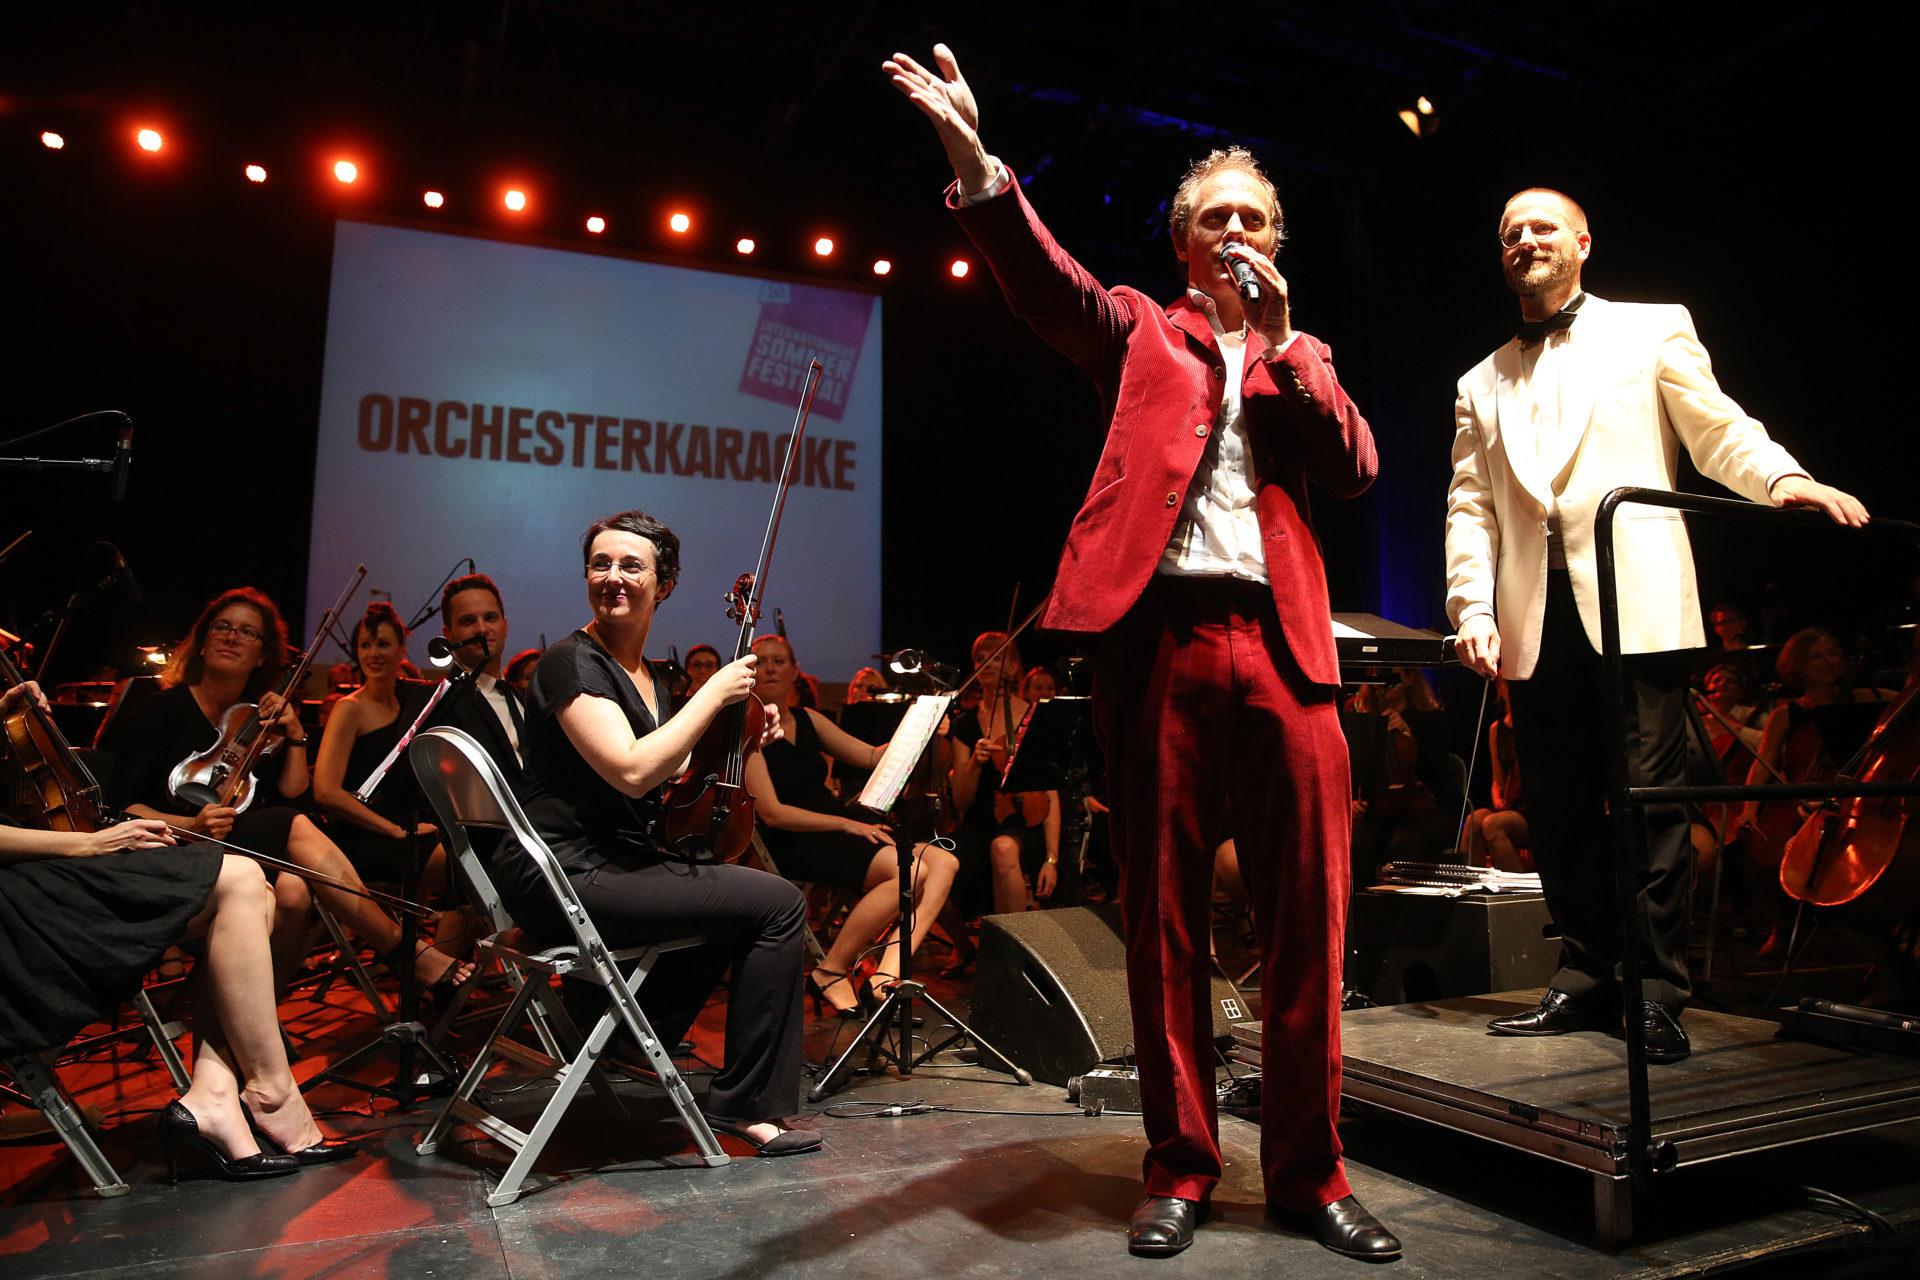 Orchesterkaraoke